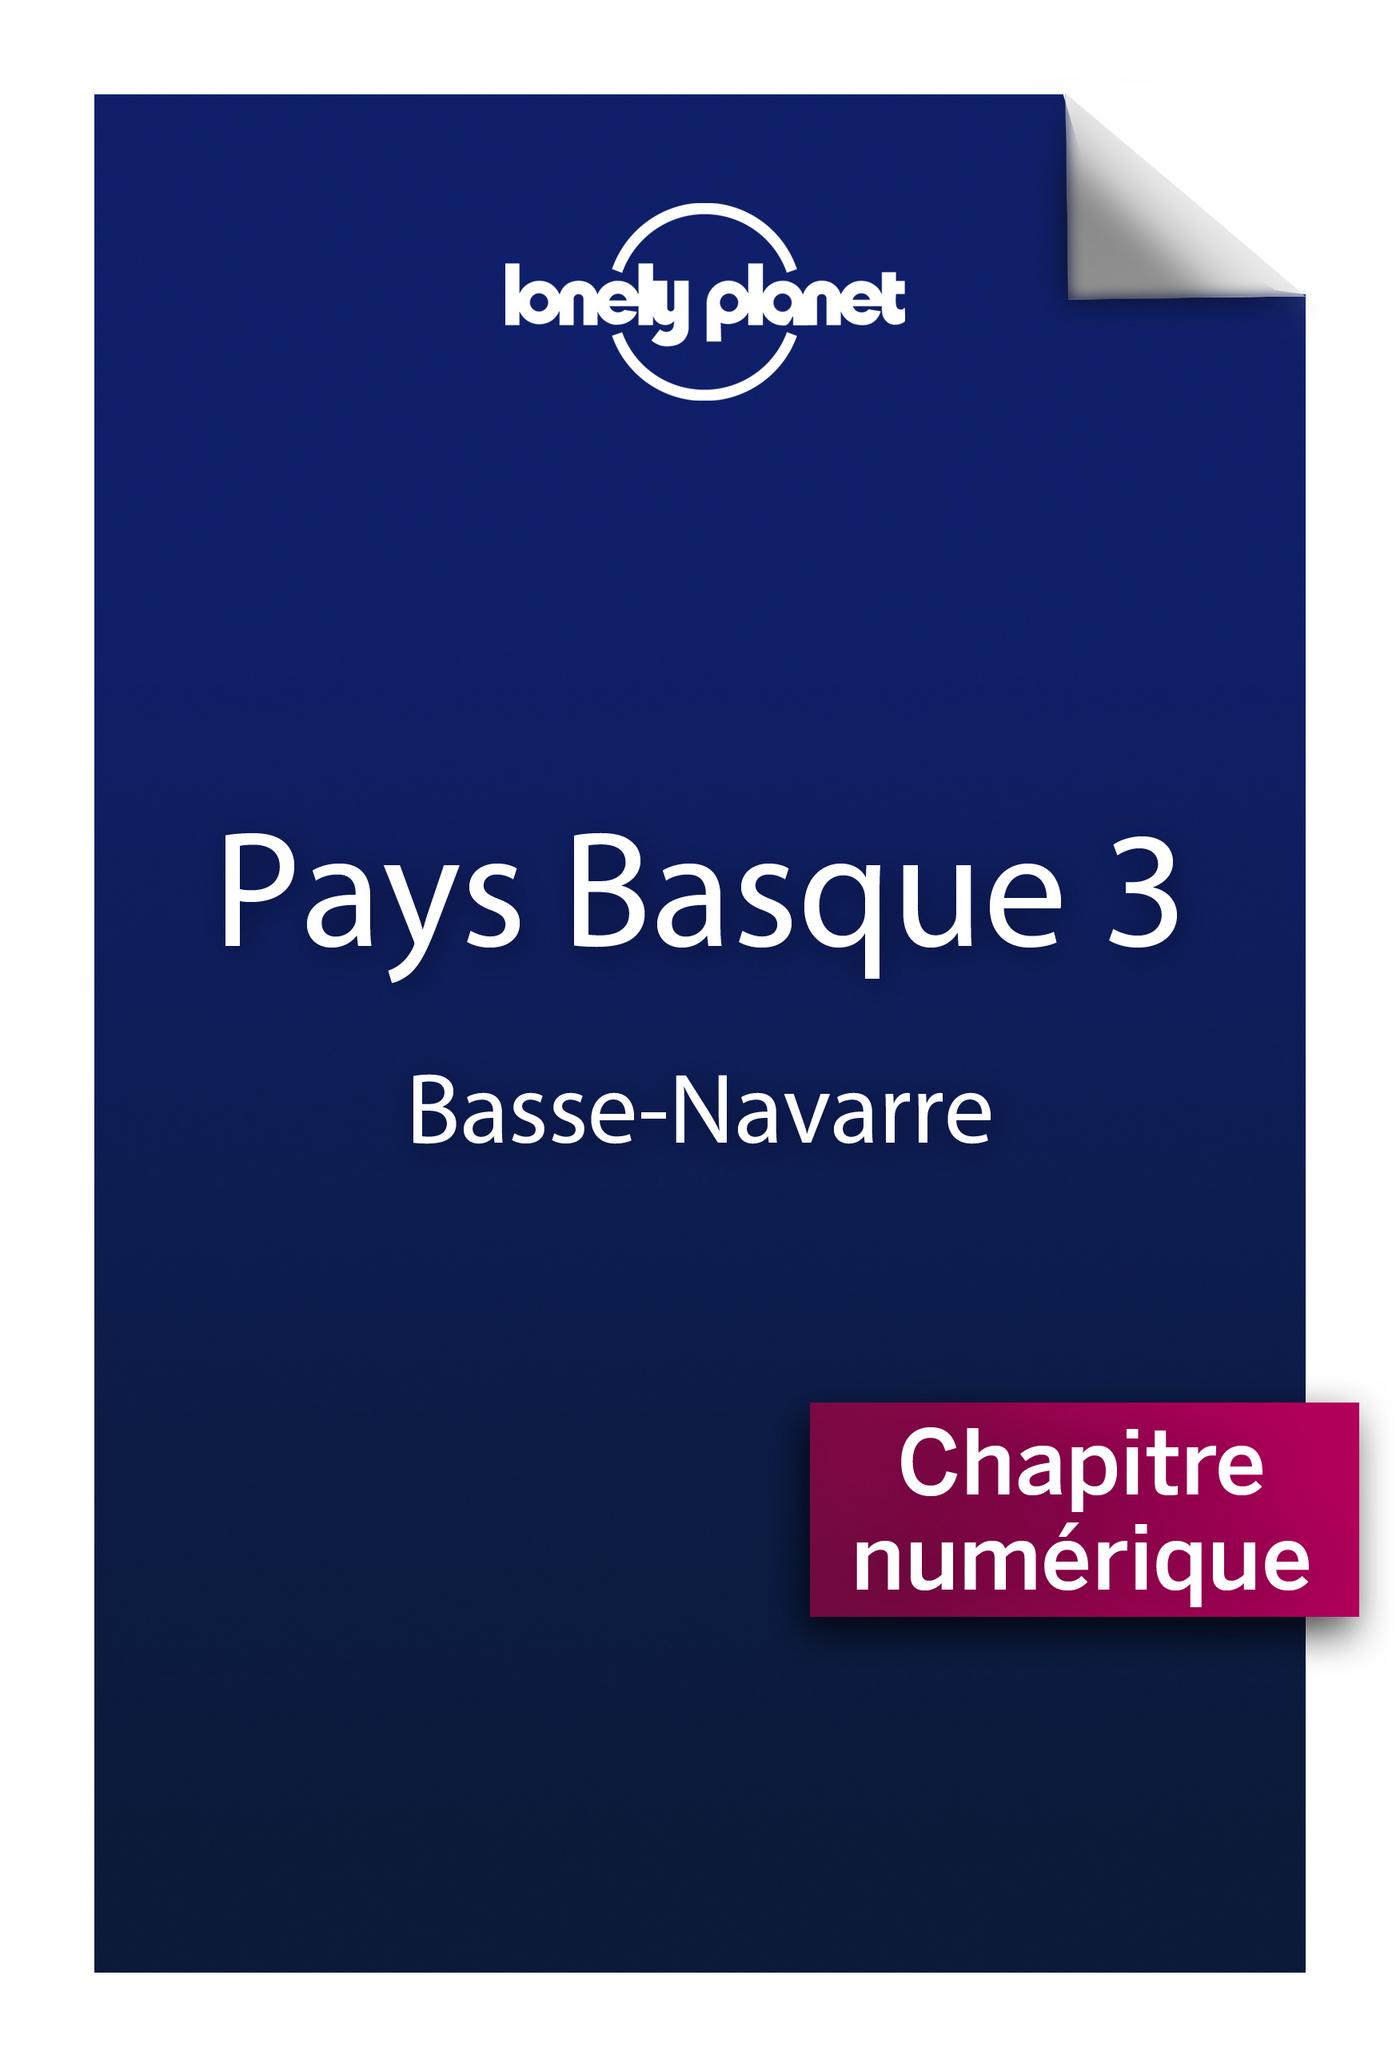 Pays basque 3 - Basse-Navarre